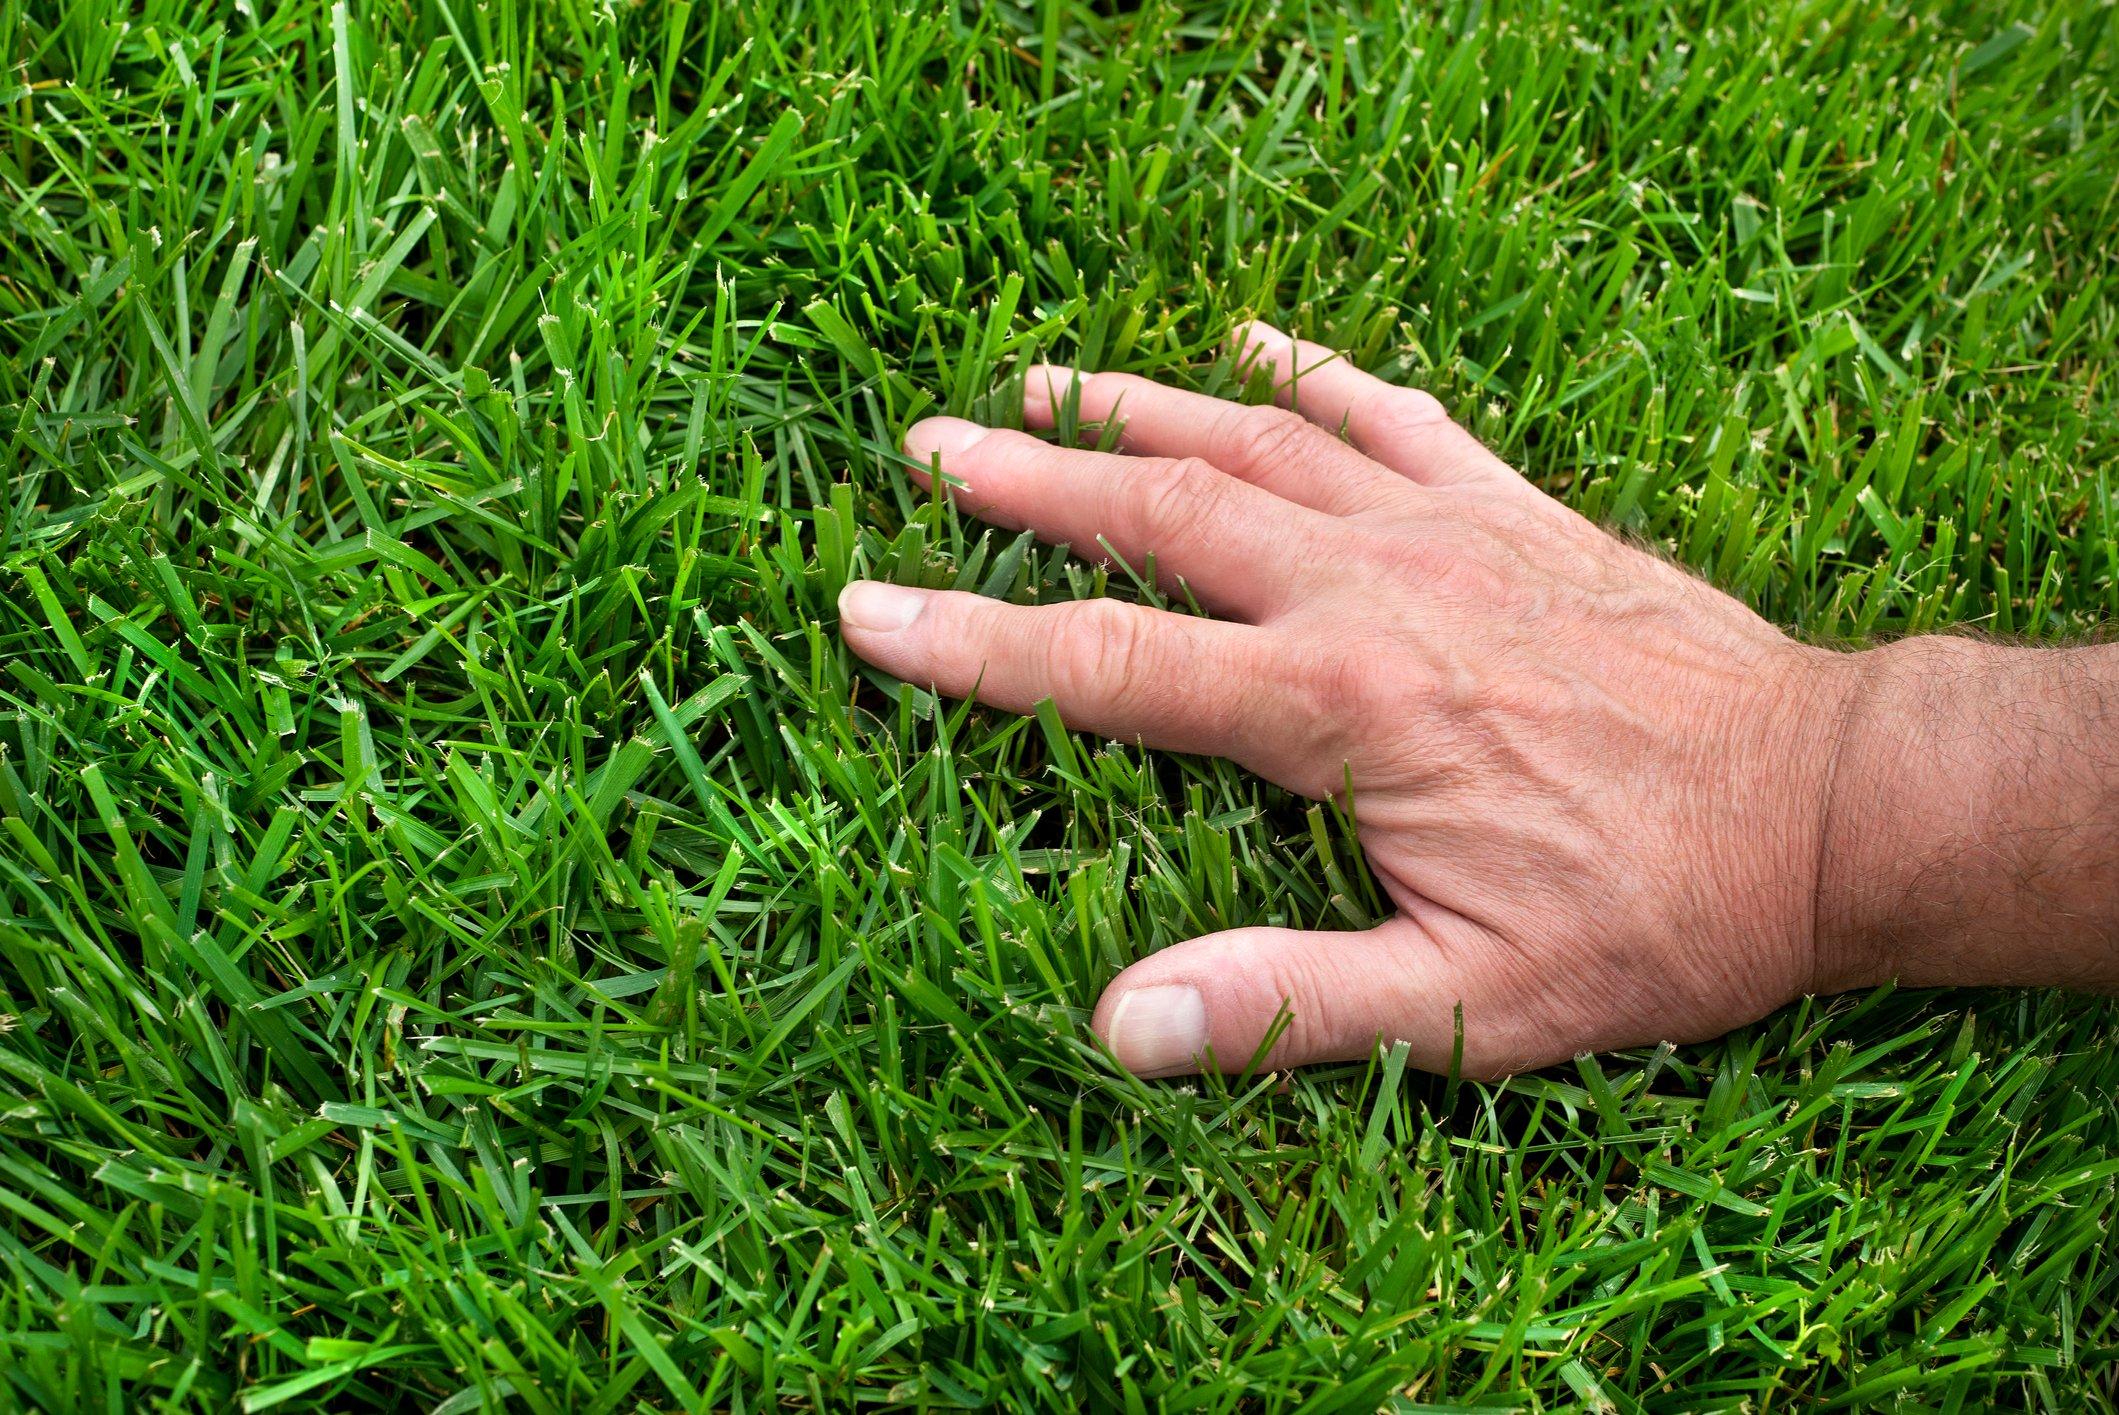 Hand running through blades of grass